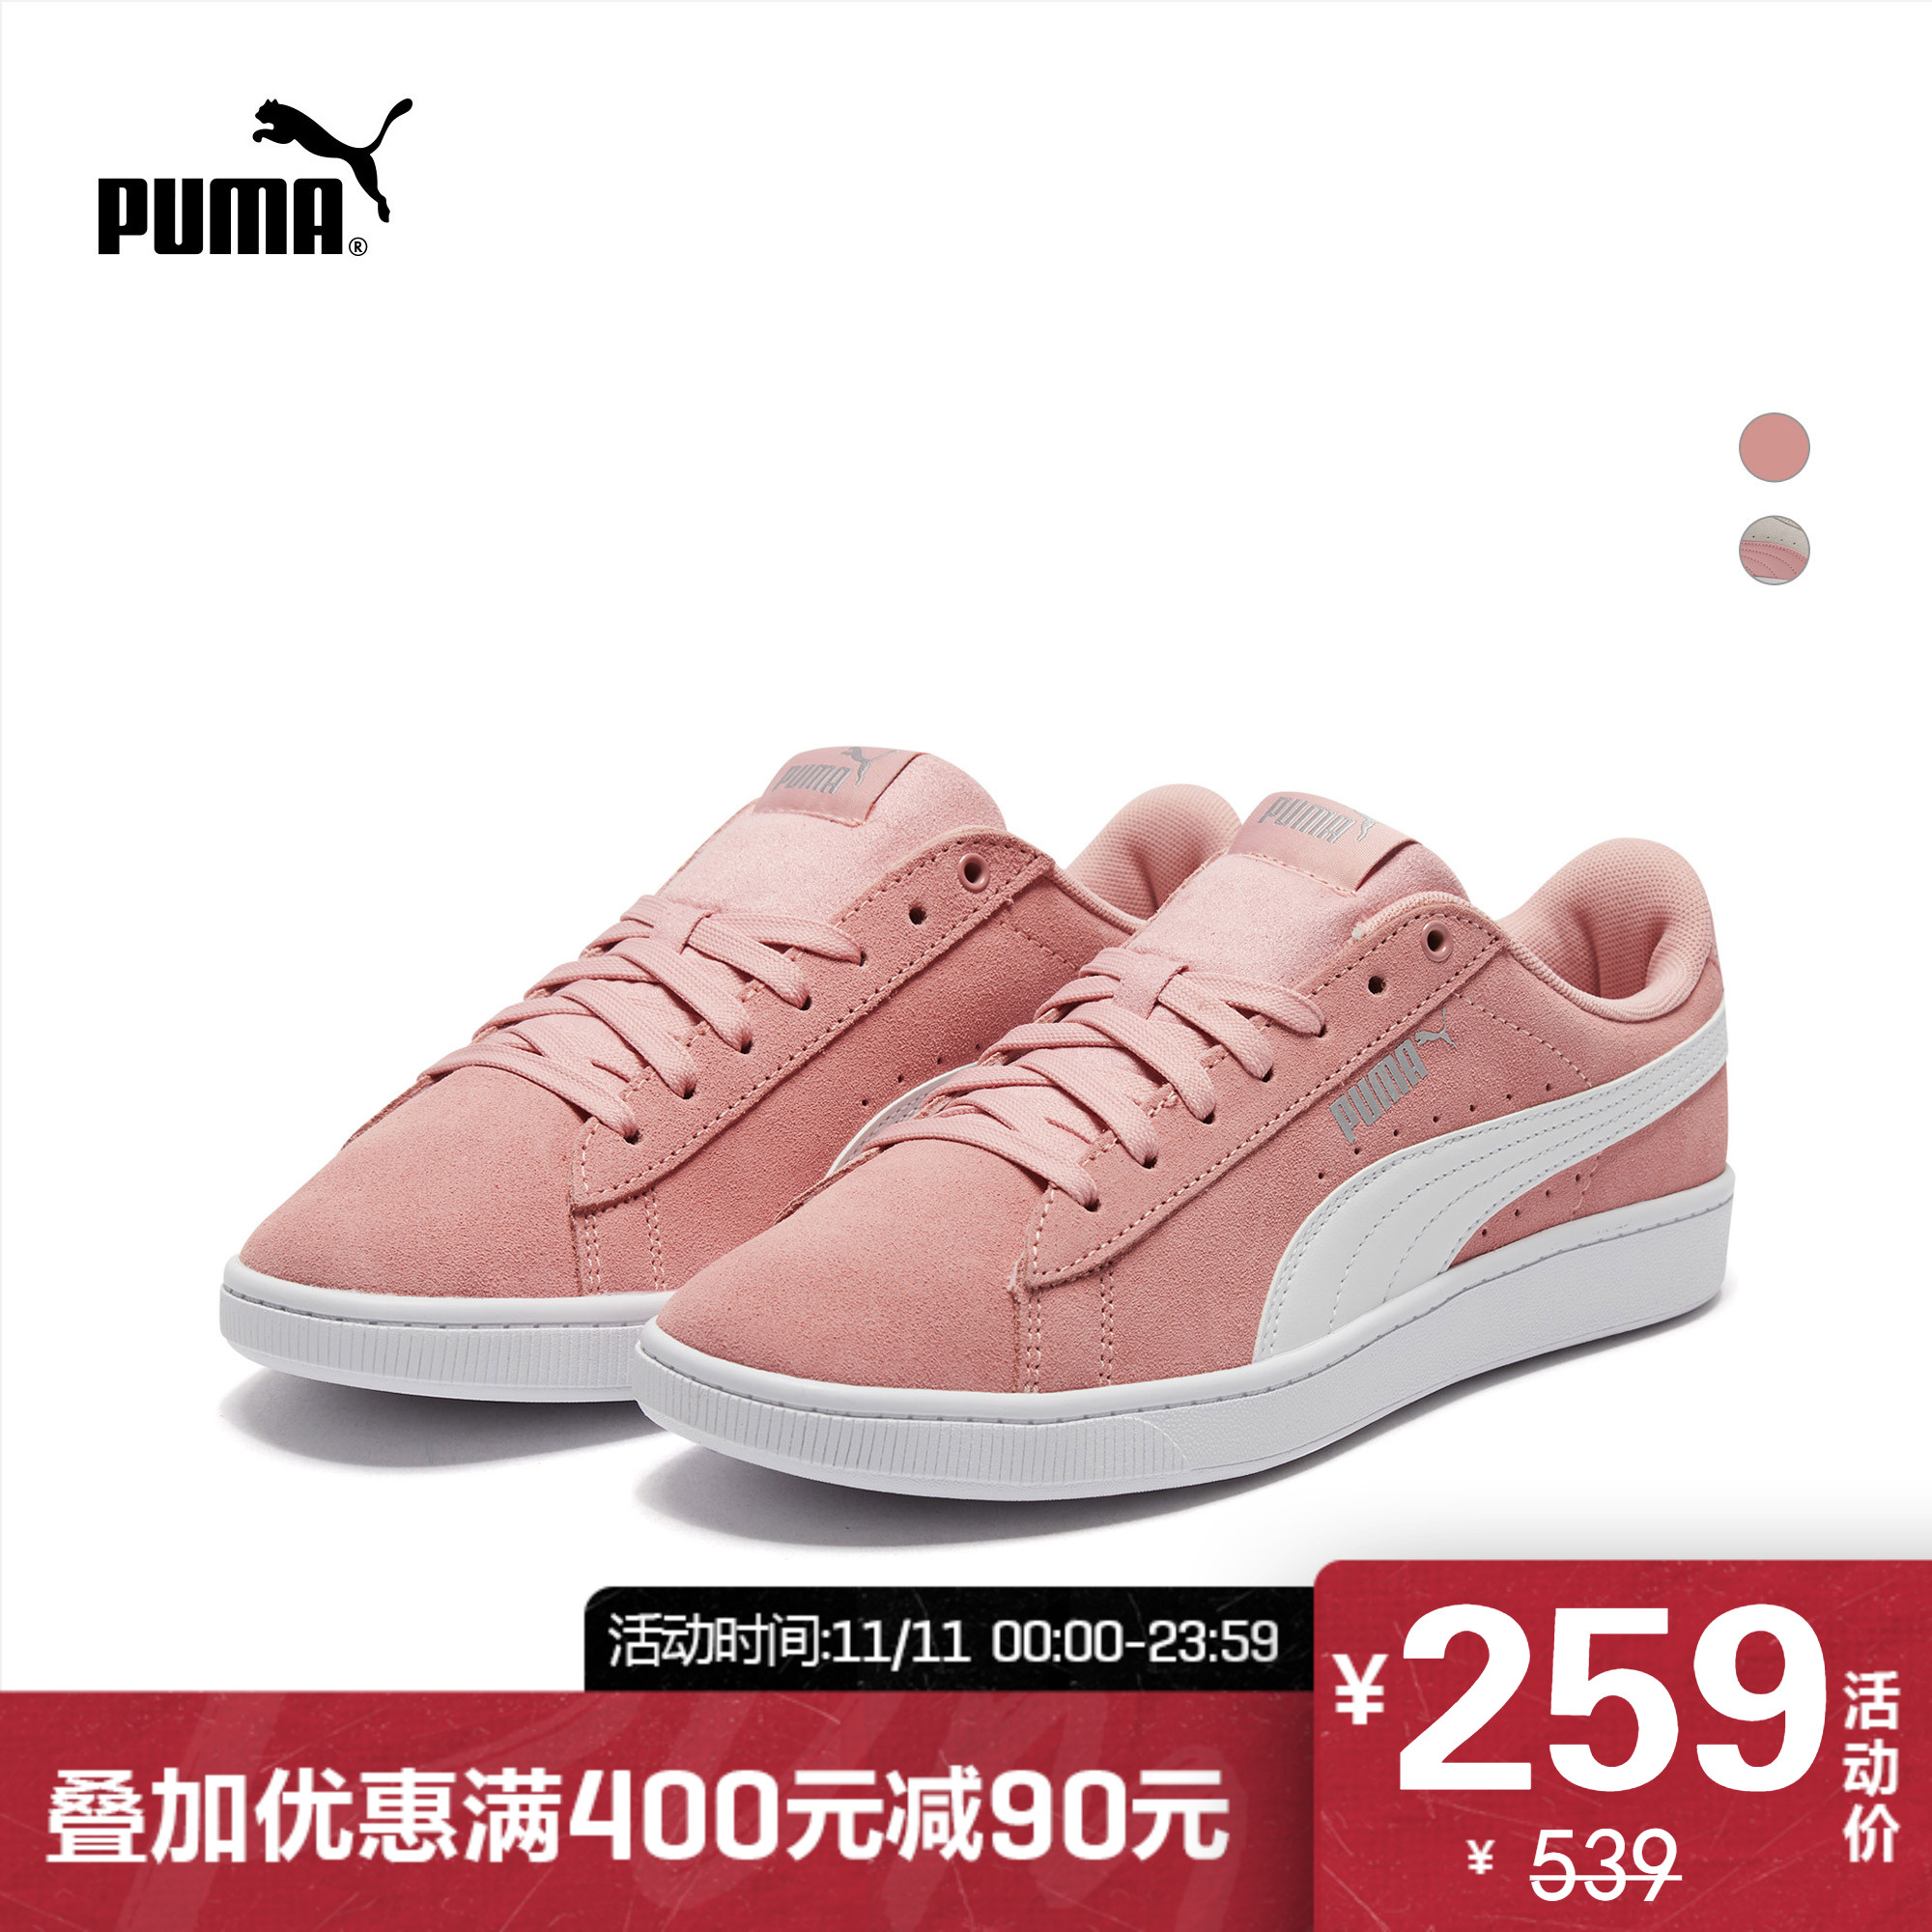 PUMA彪马官方正品 女子翻毛皮滑板鞋休闲鞋Vikky V2 369725